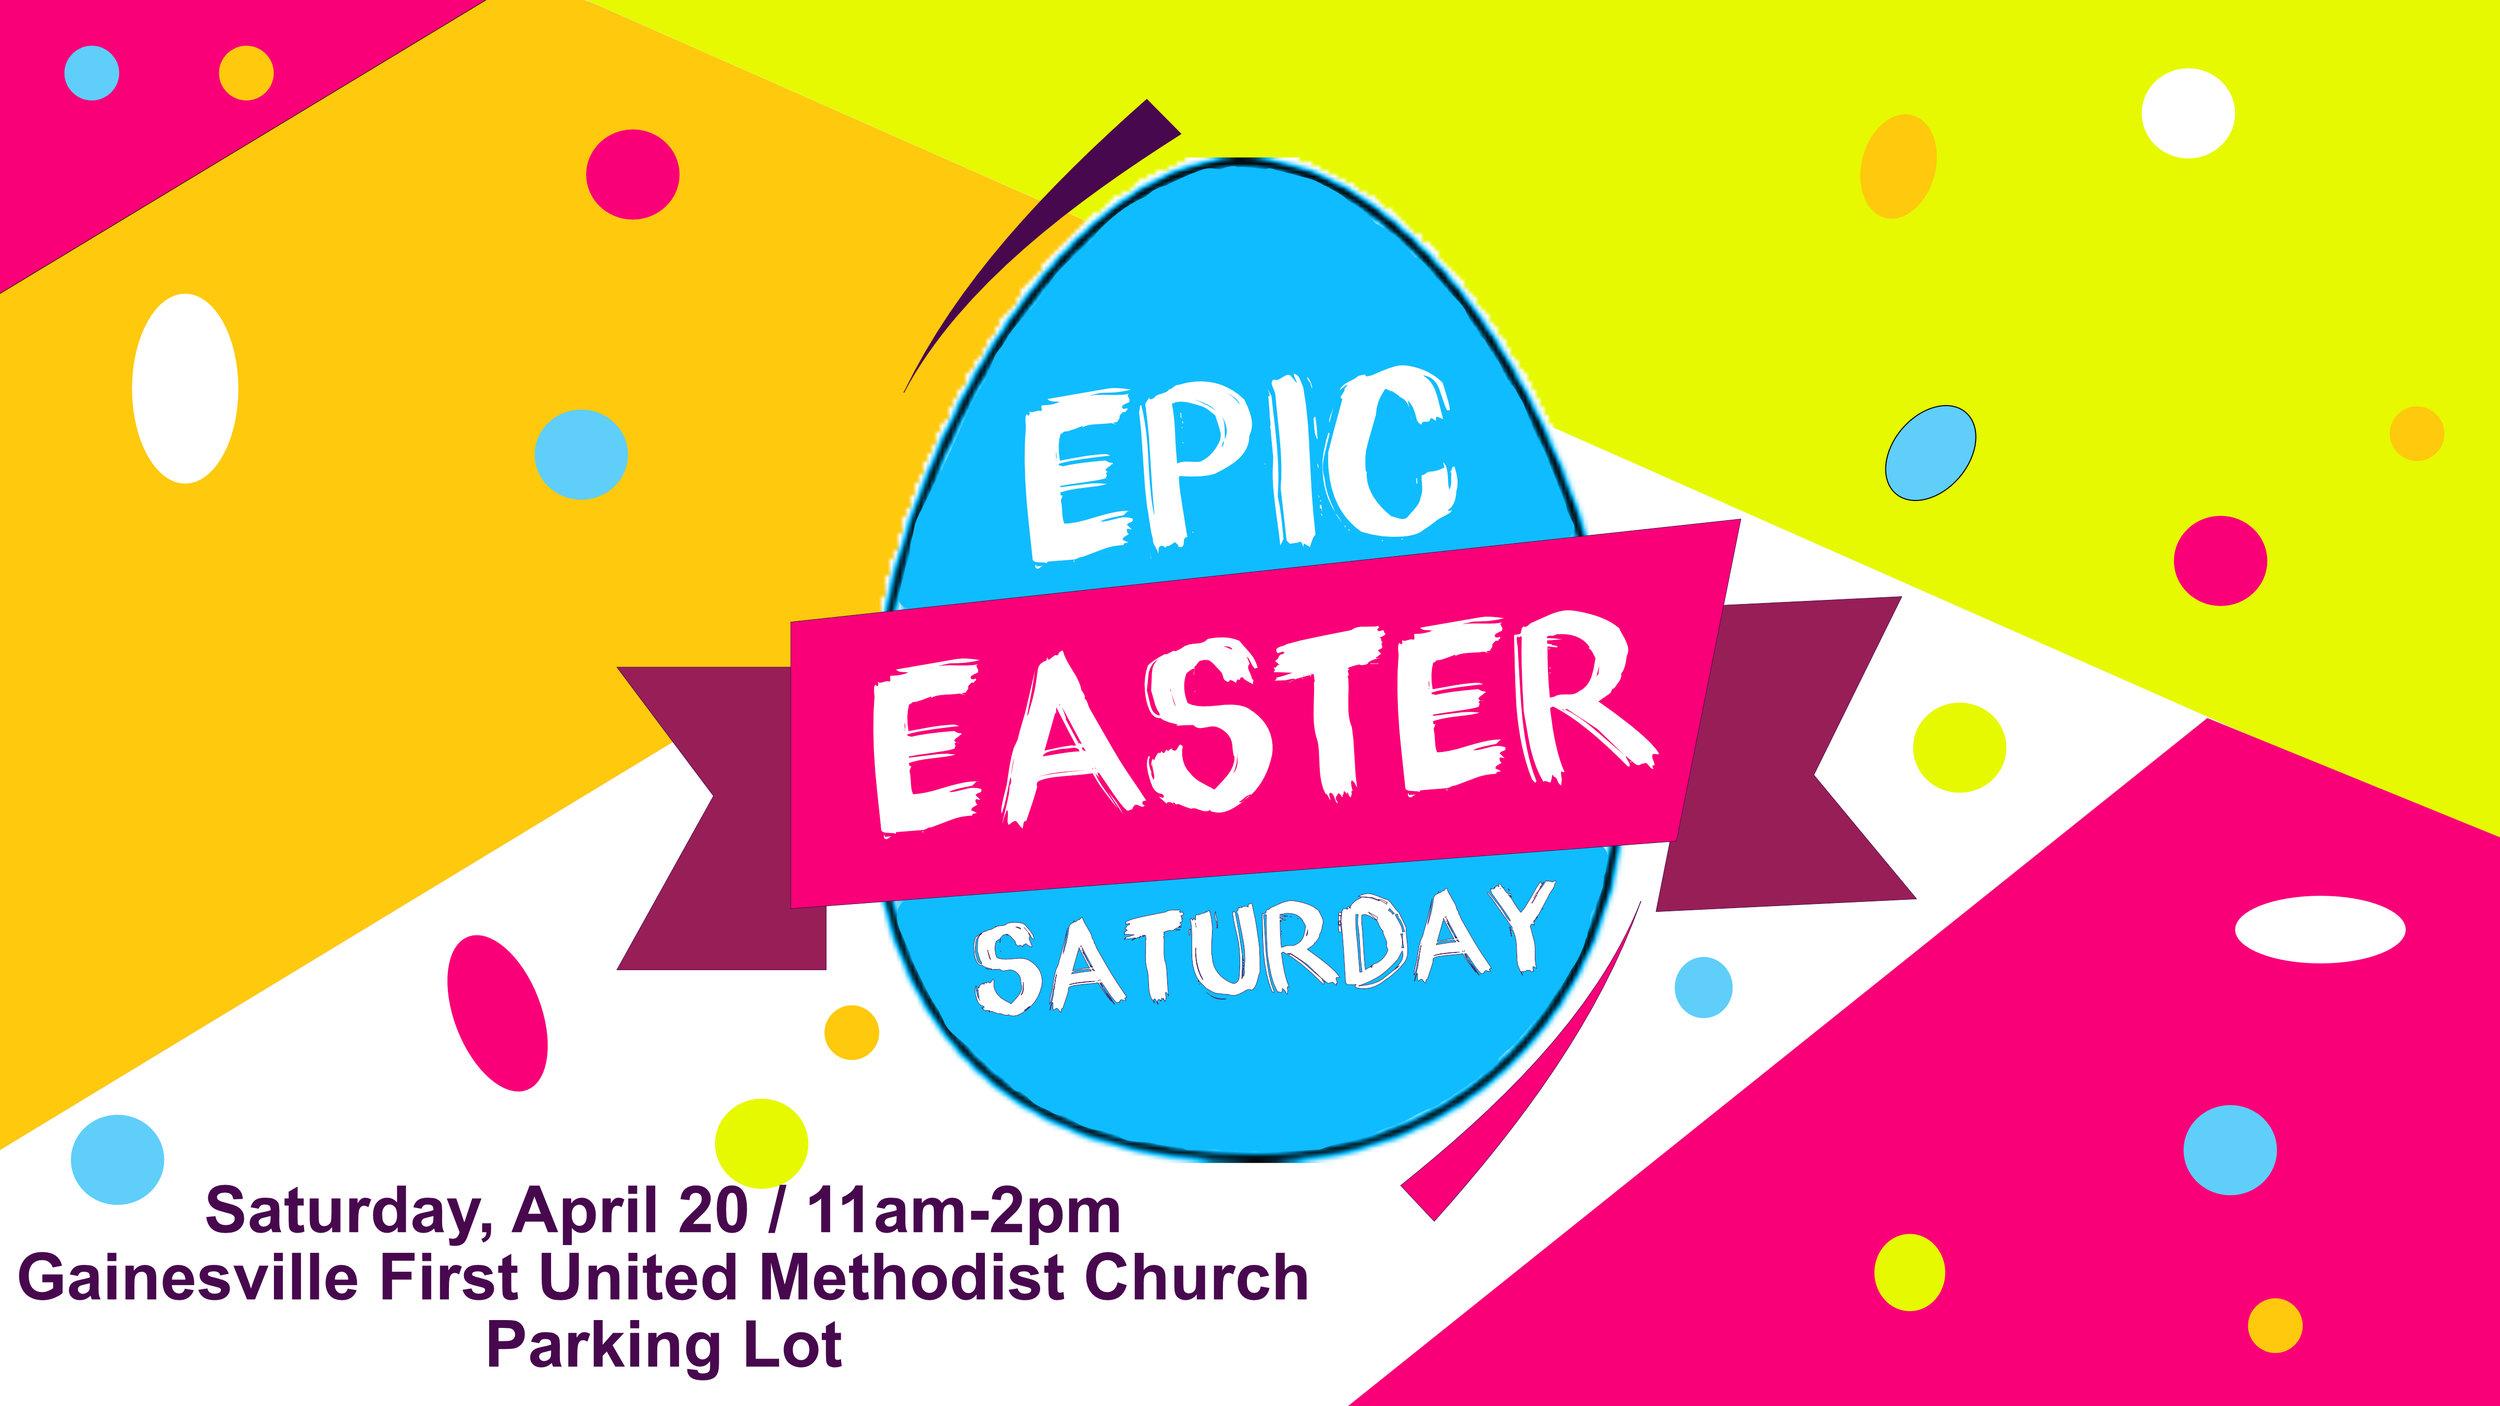 epic easter saturday logo.jpg